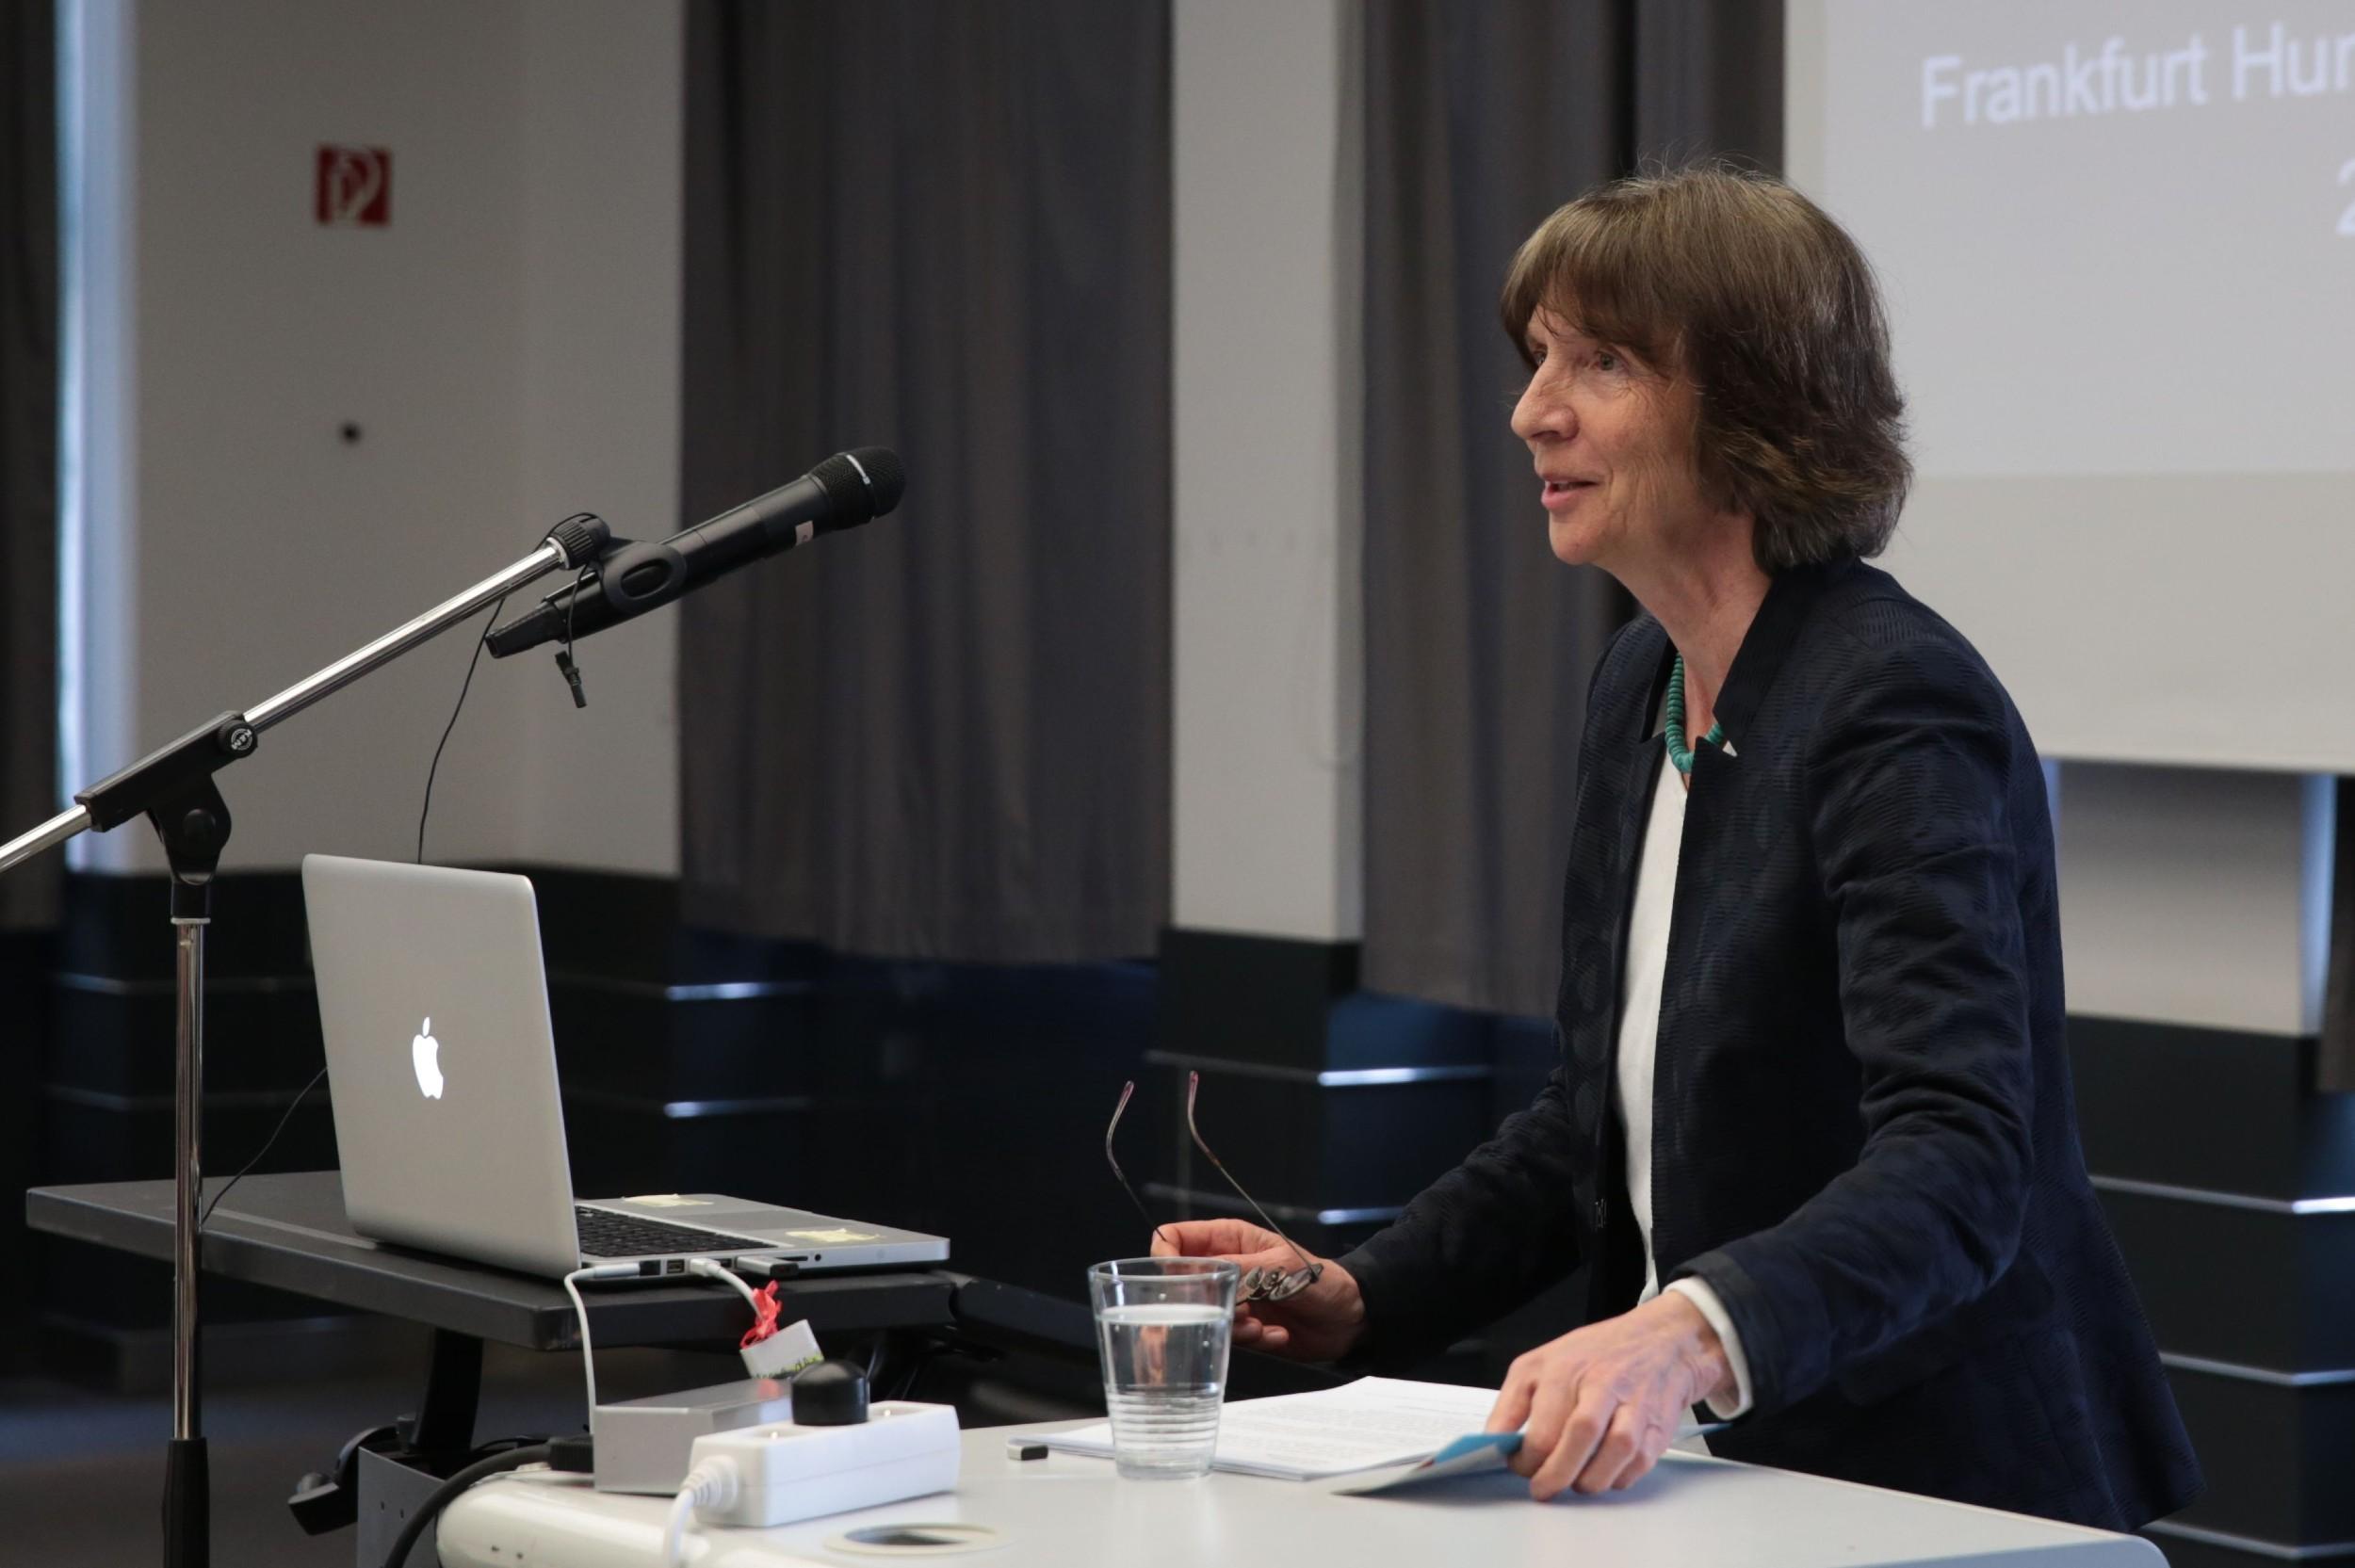 Nemačka teoretičarka kulture Alajda Asman tokom predavanja (Foto: Ricarda Menn)